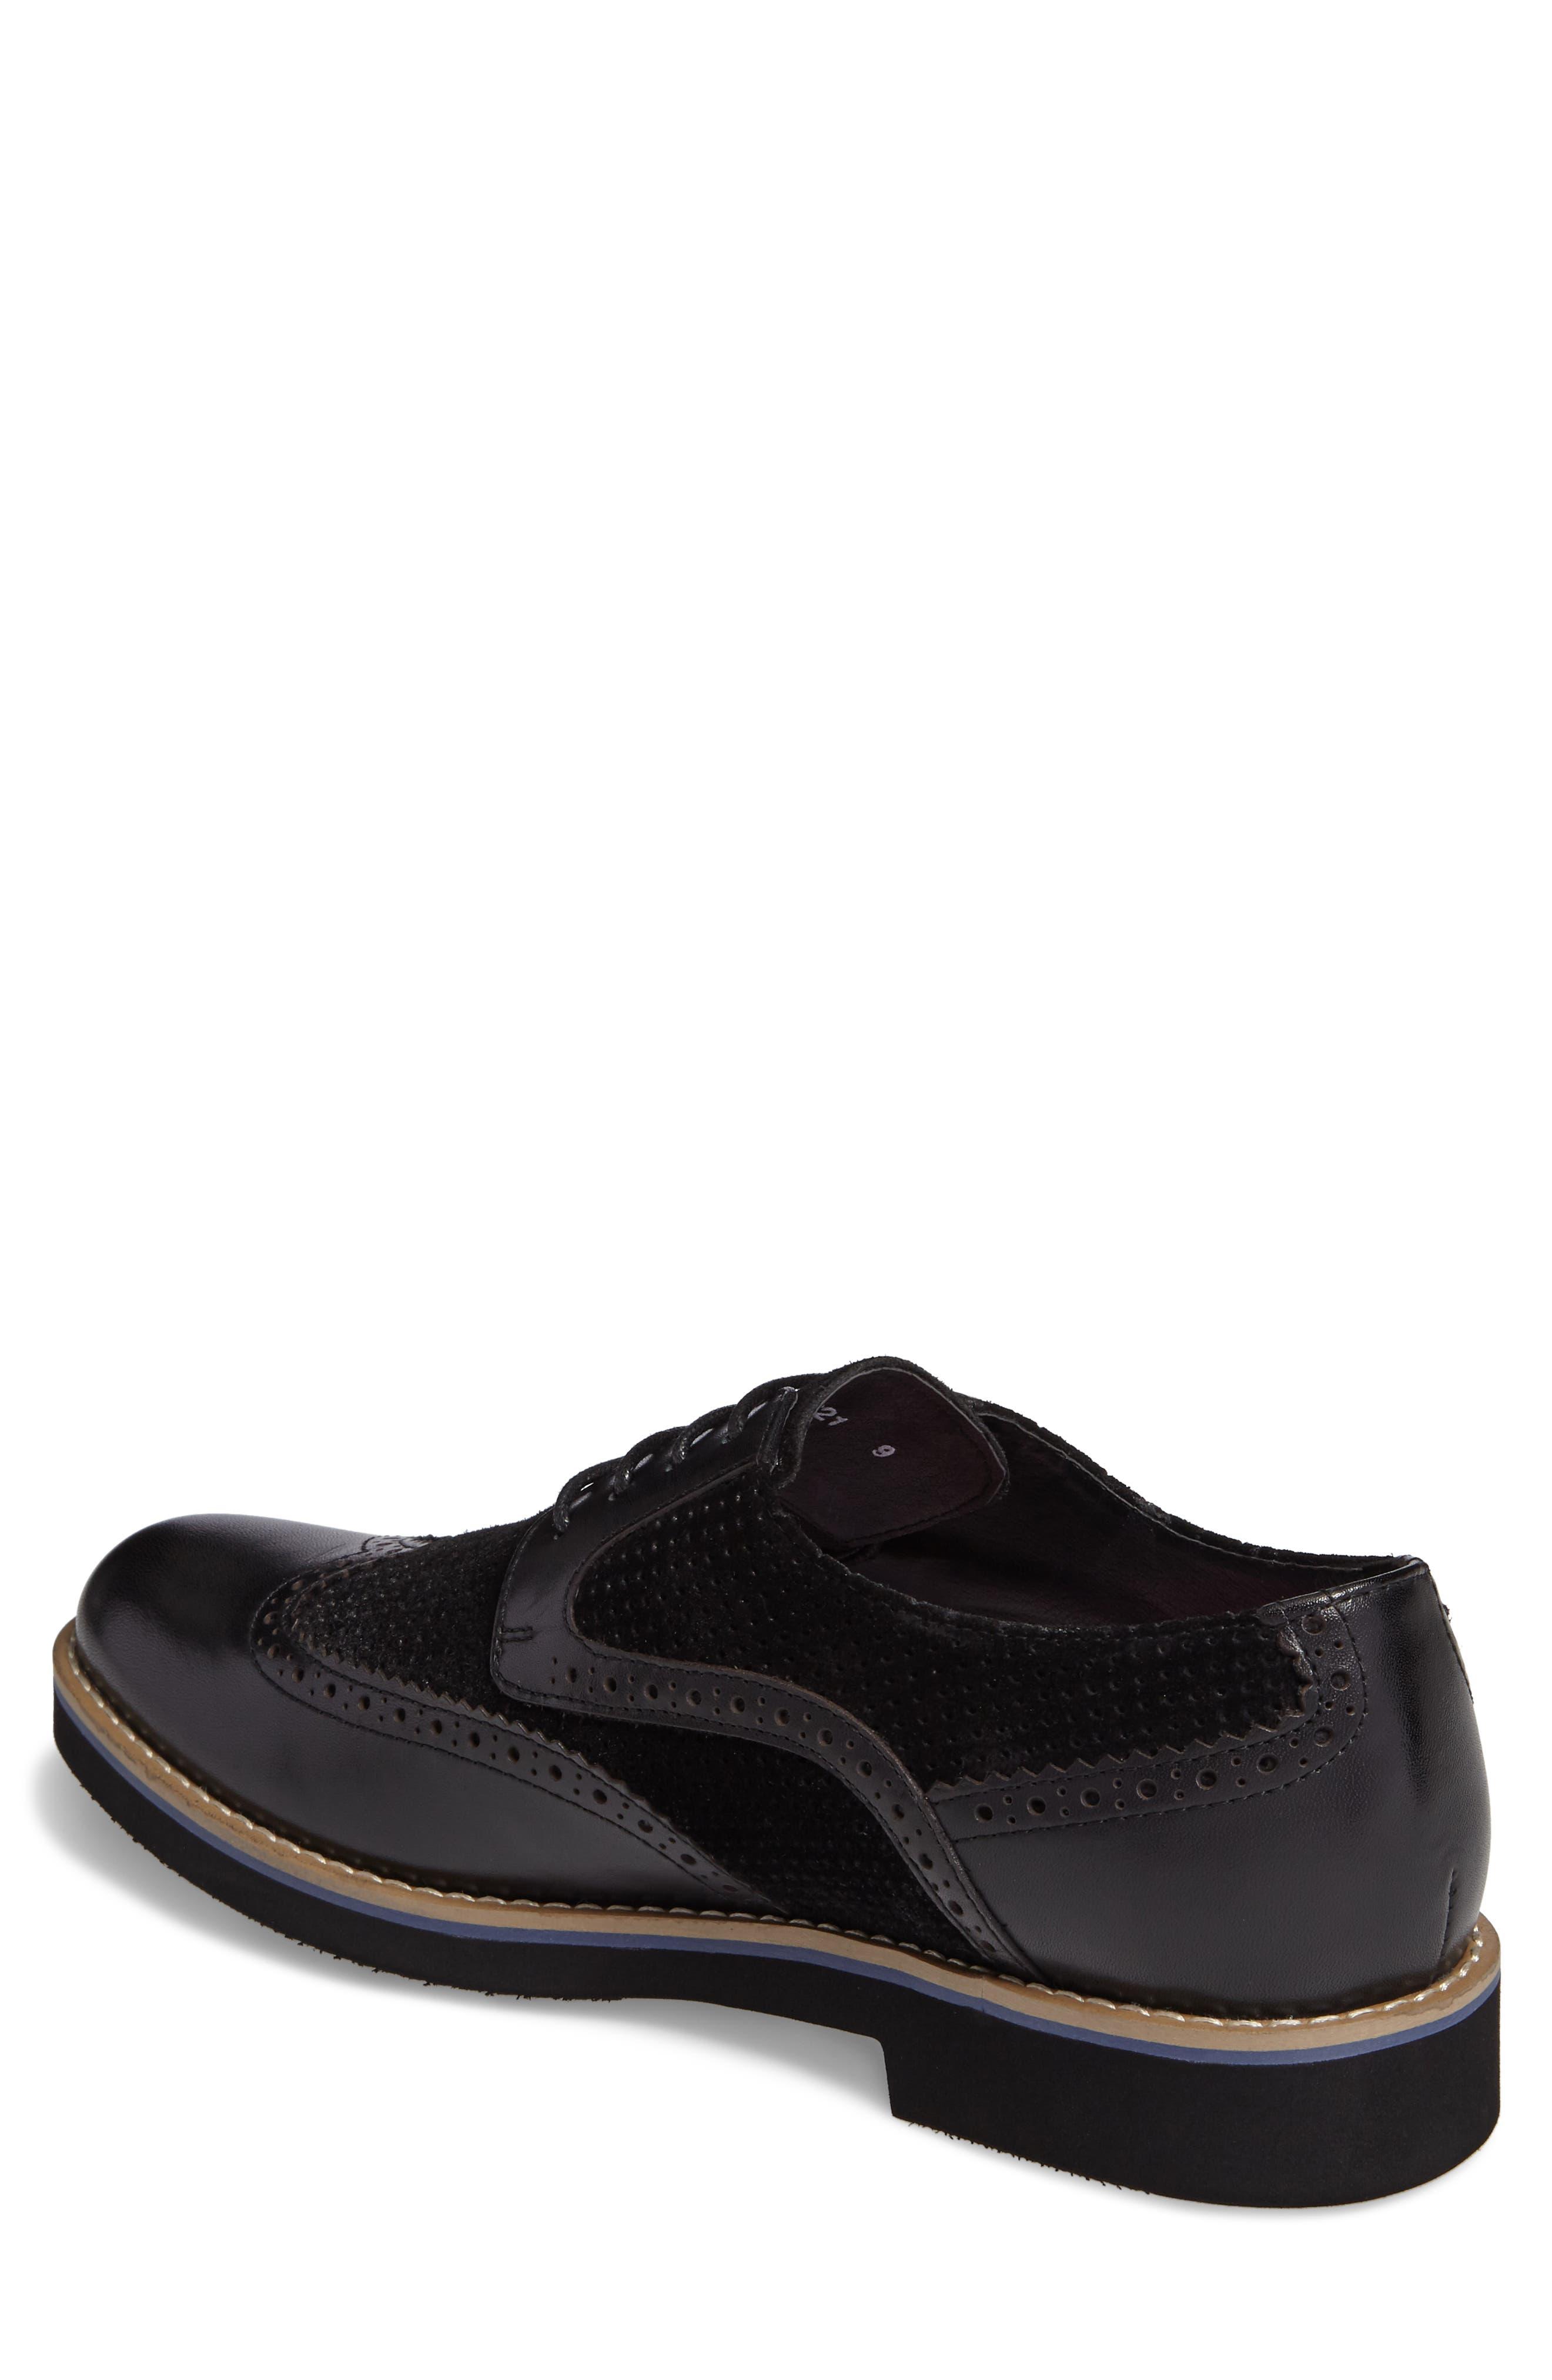 Maritime Spectator Shoe,                             Alternate thumbnail 2, color,                             Black Leather